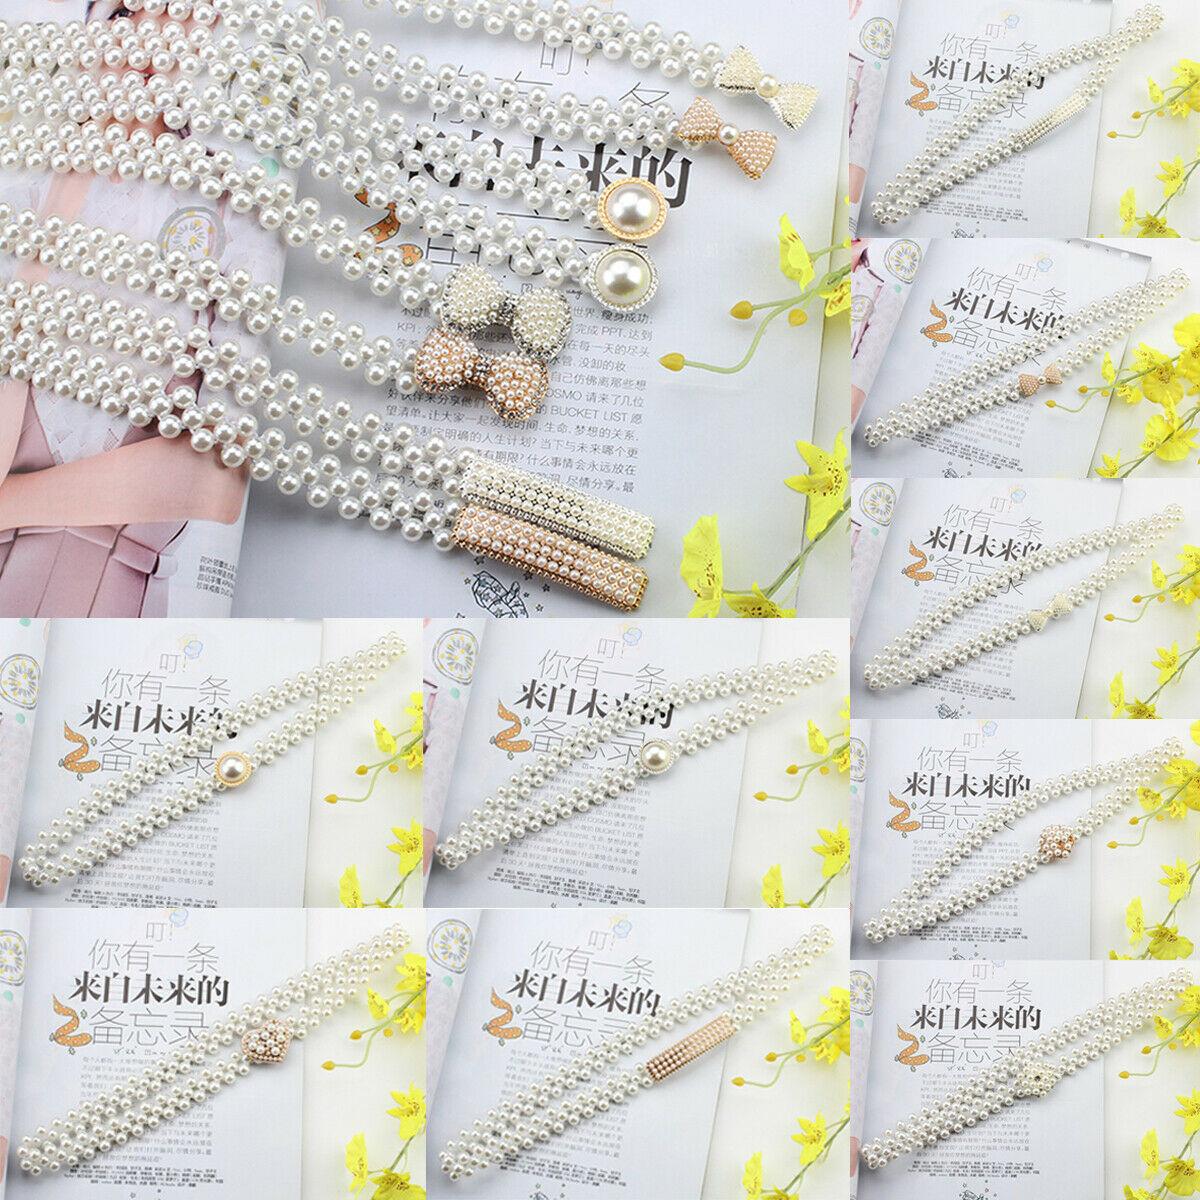 Brand New Rhinestone Buckle Pearl Elastic Belt Women Pearl Fashion Stretch Buckle Skinny Waist Chain Waistband Dress